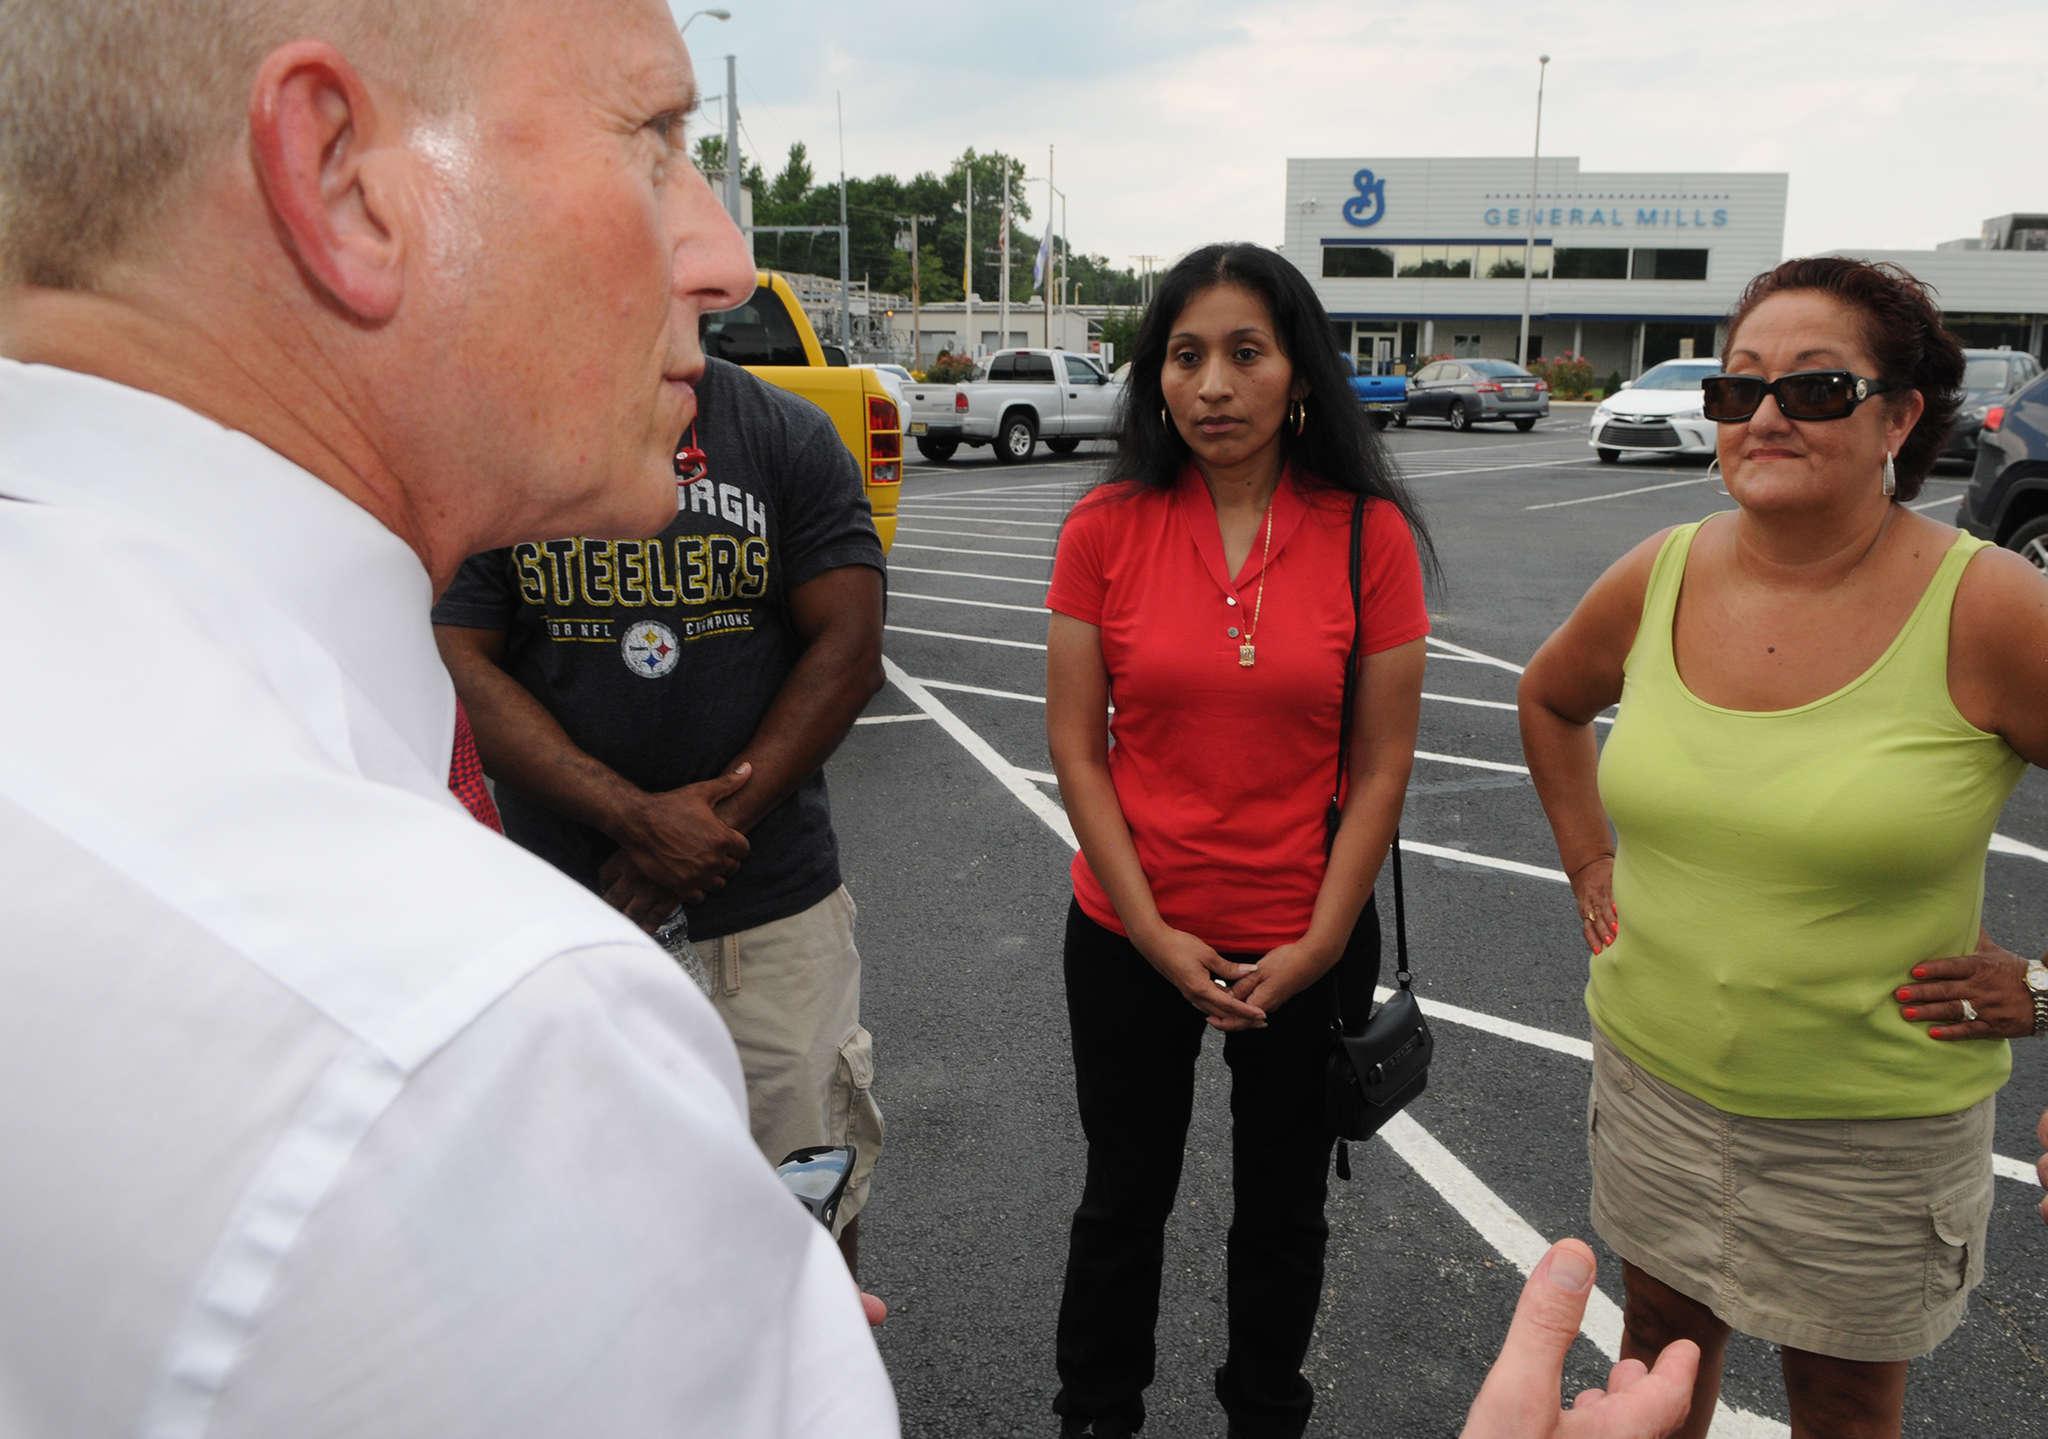 State Sen. Jeff Van Drew talks to Progresso workers (from left) Derrell Jarmon, Rafaela Felipe, and Nelly Lorenzana outside their Vineland plant.